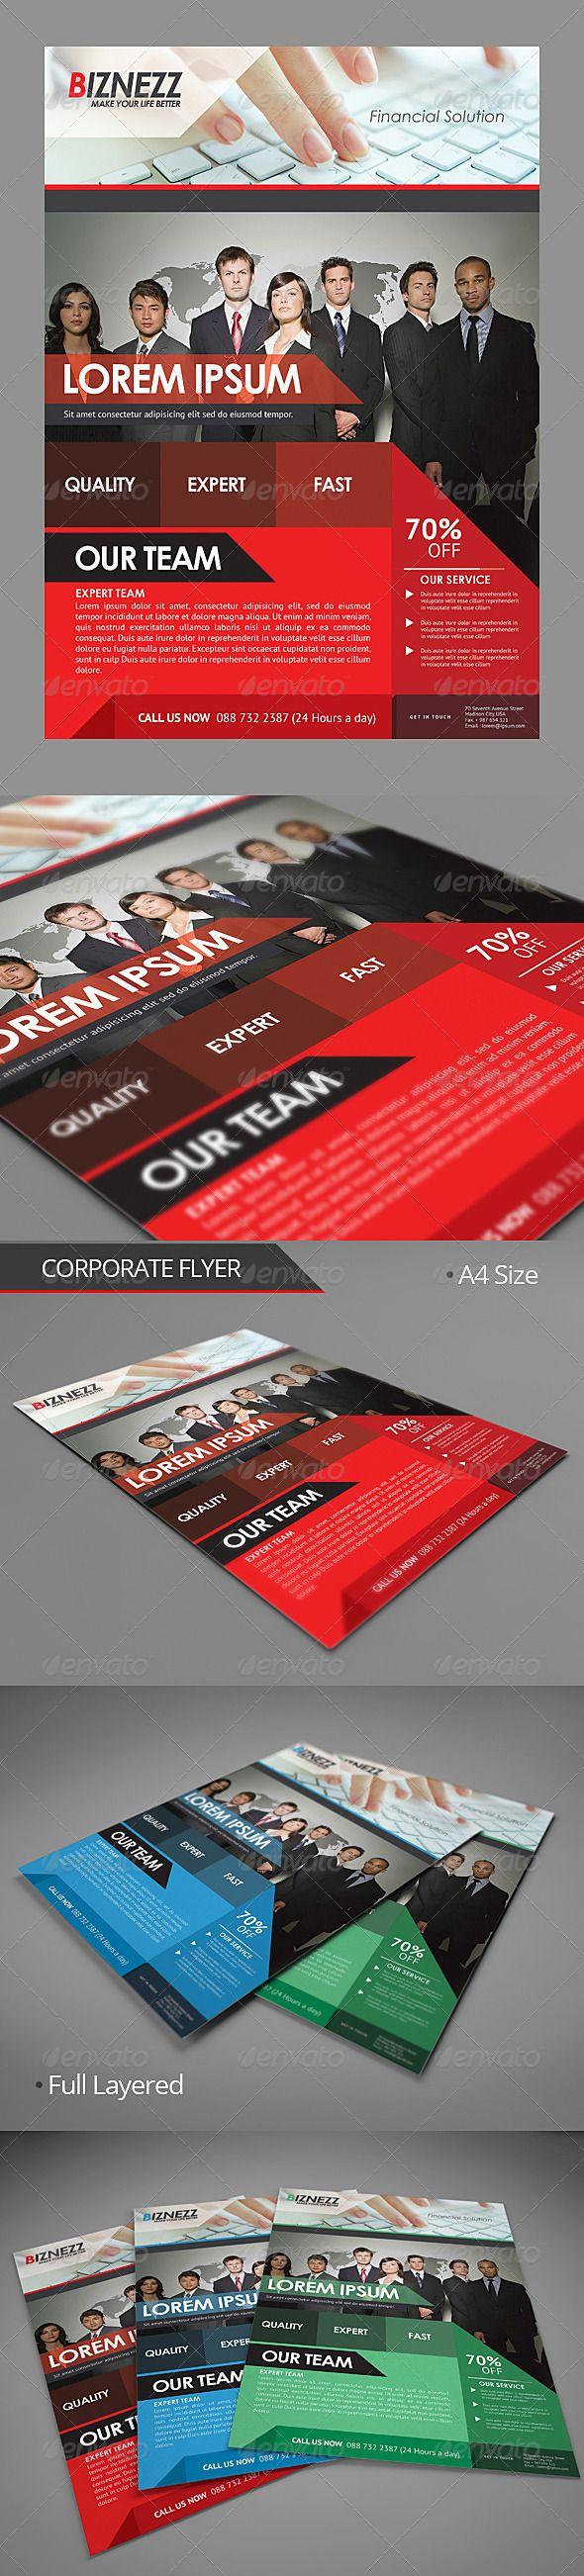 94 Best Corporate Flyer Images On Pinterest Corporate Flyer Flyer